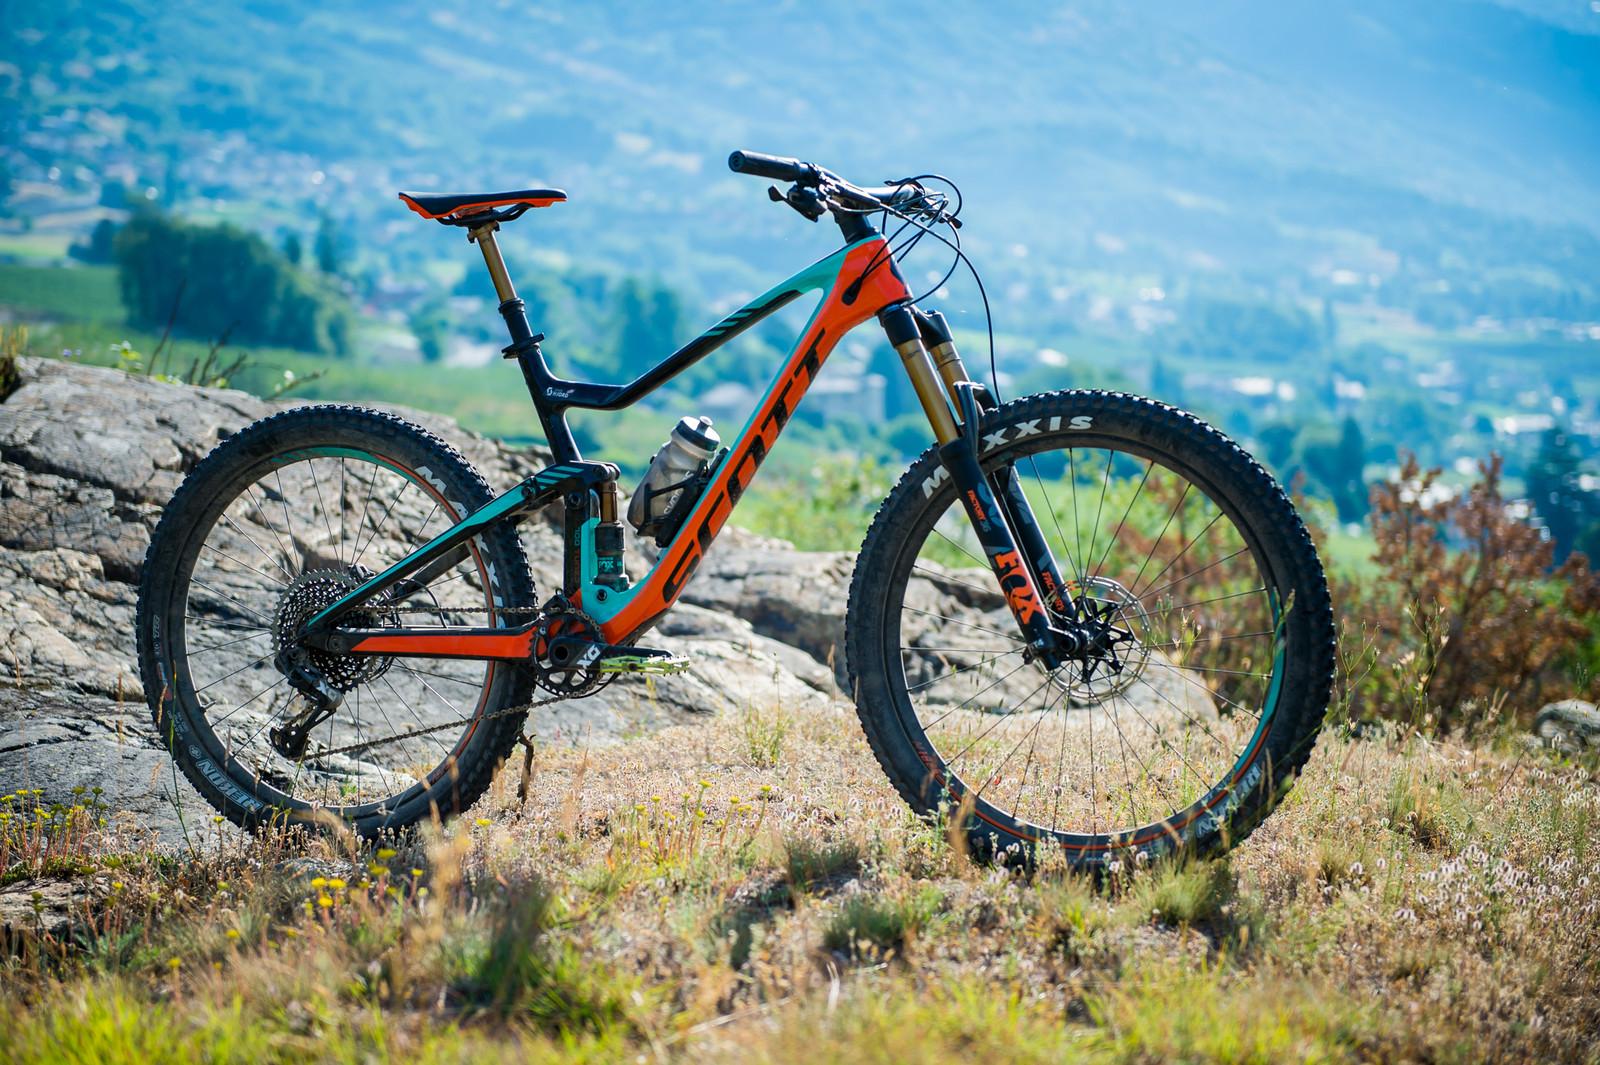 Reviews Com Product Reviews And Comparisons Of 2018 >> 2018 Scott Genius 700 Tuned Bike - Reviews, Comparisons, Specs - Mountain Bikes - Vital MTB